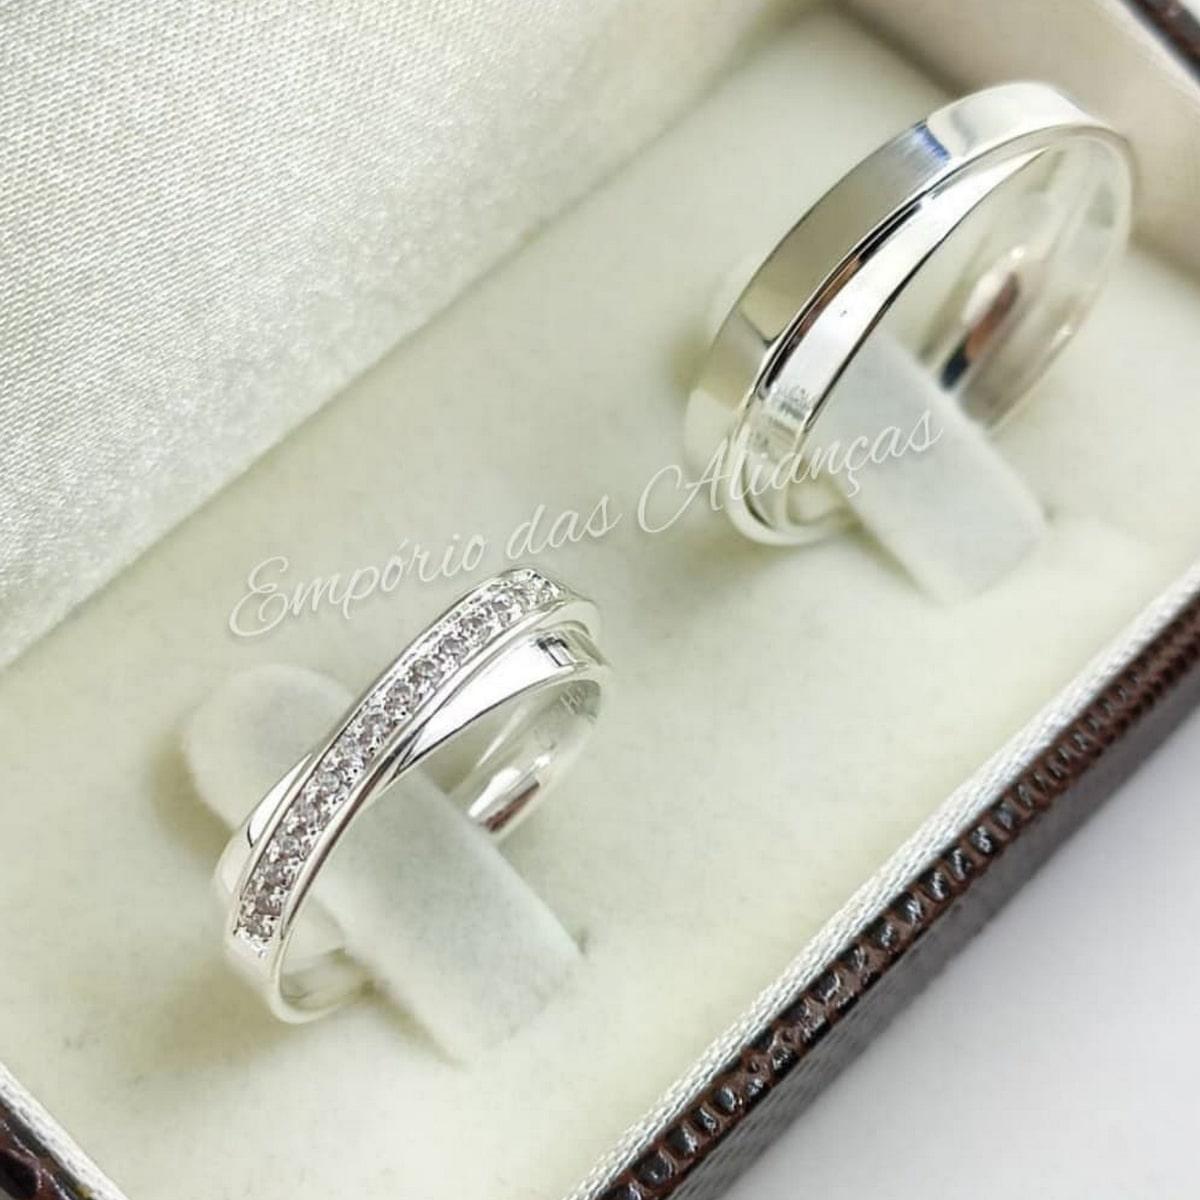 Alianças Prata Namoro Compromisso Pedra